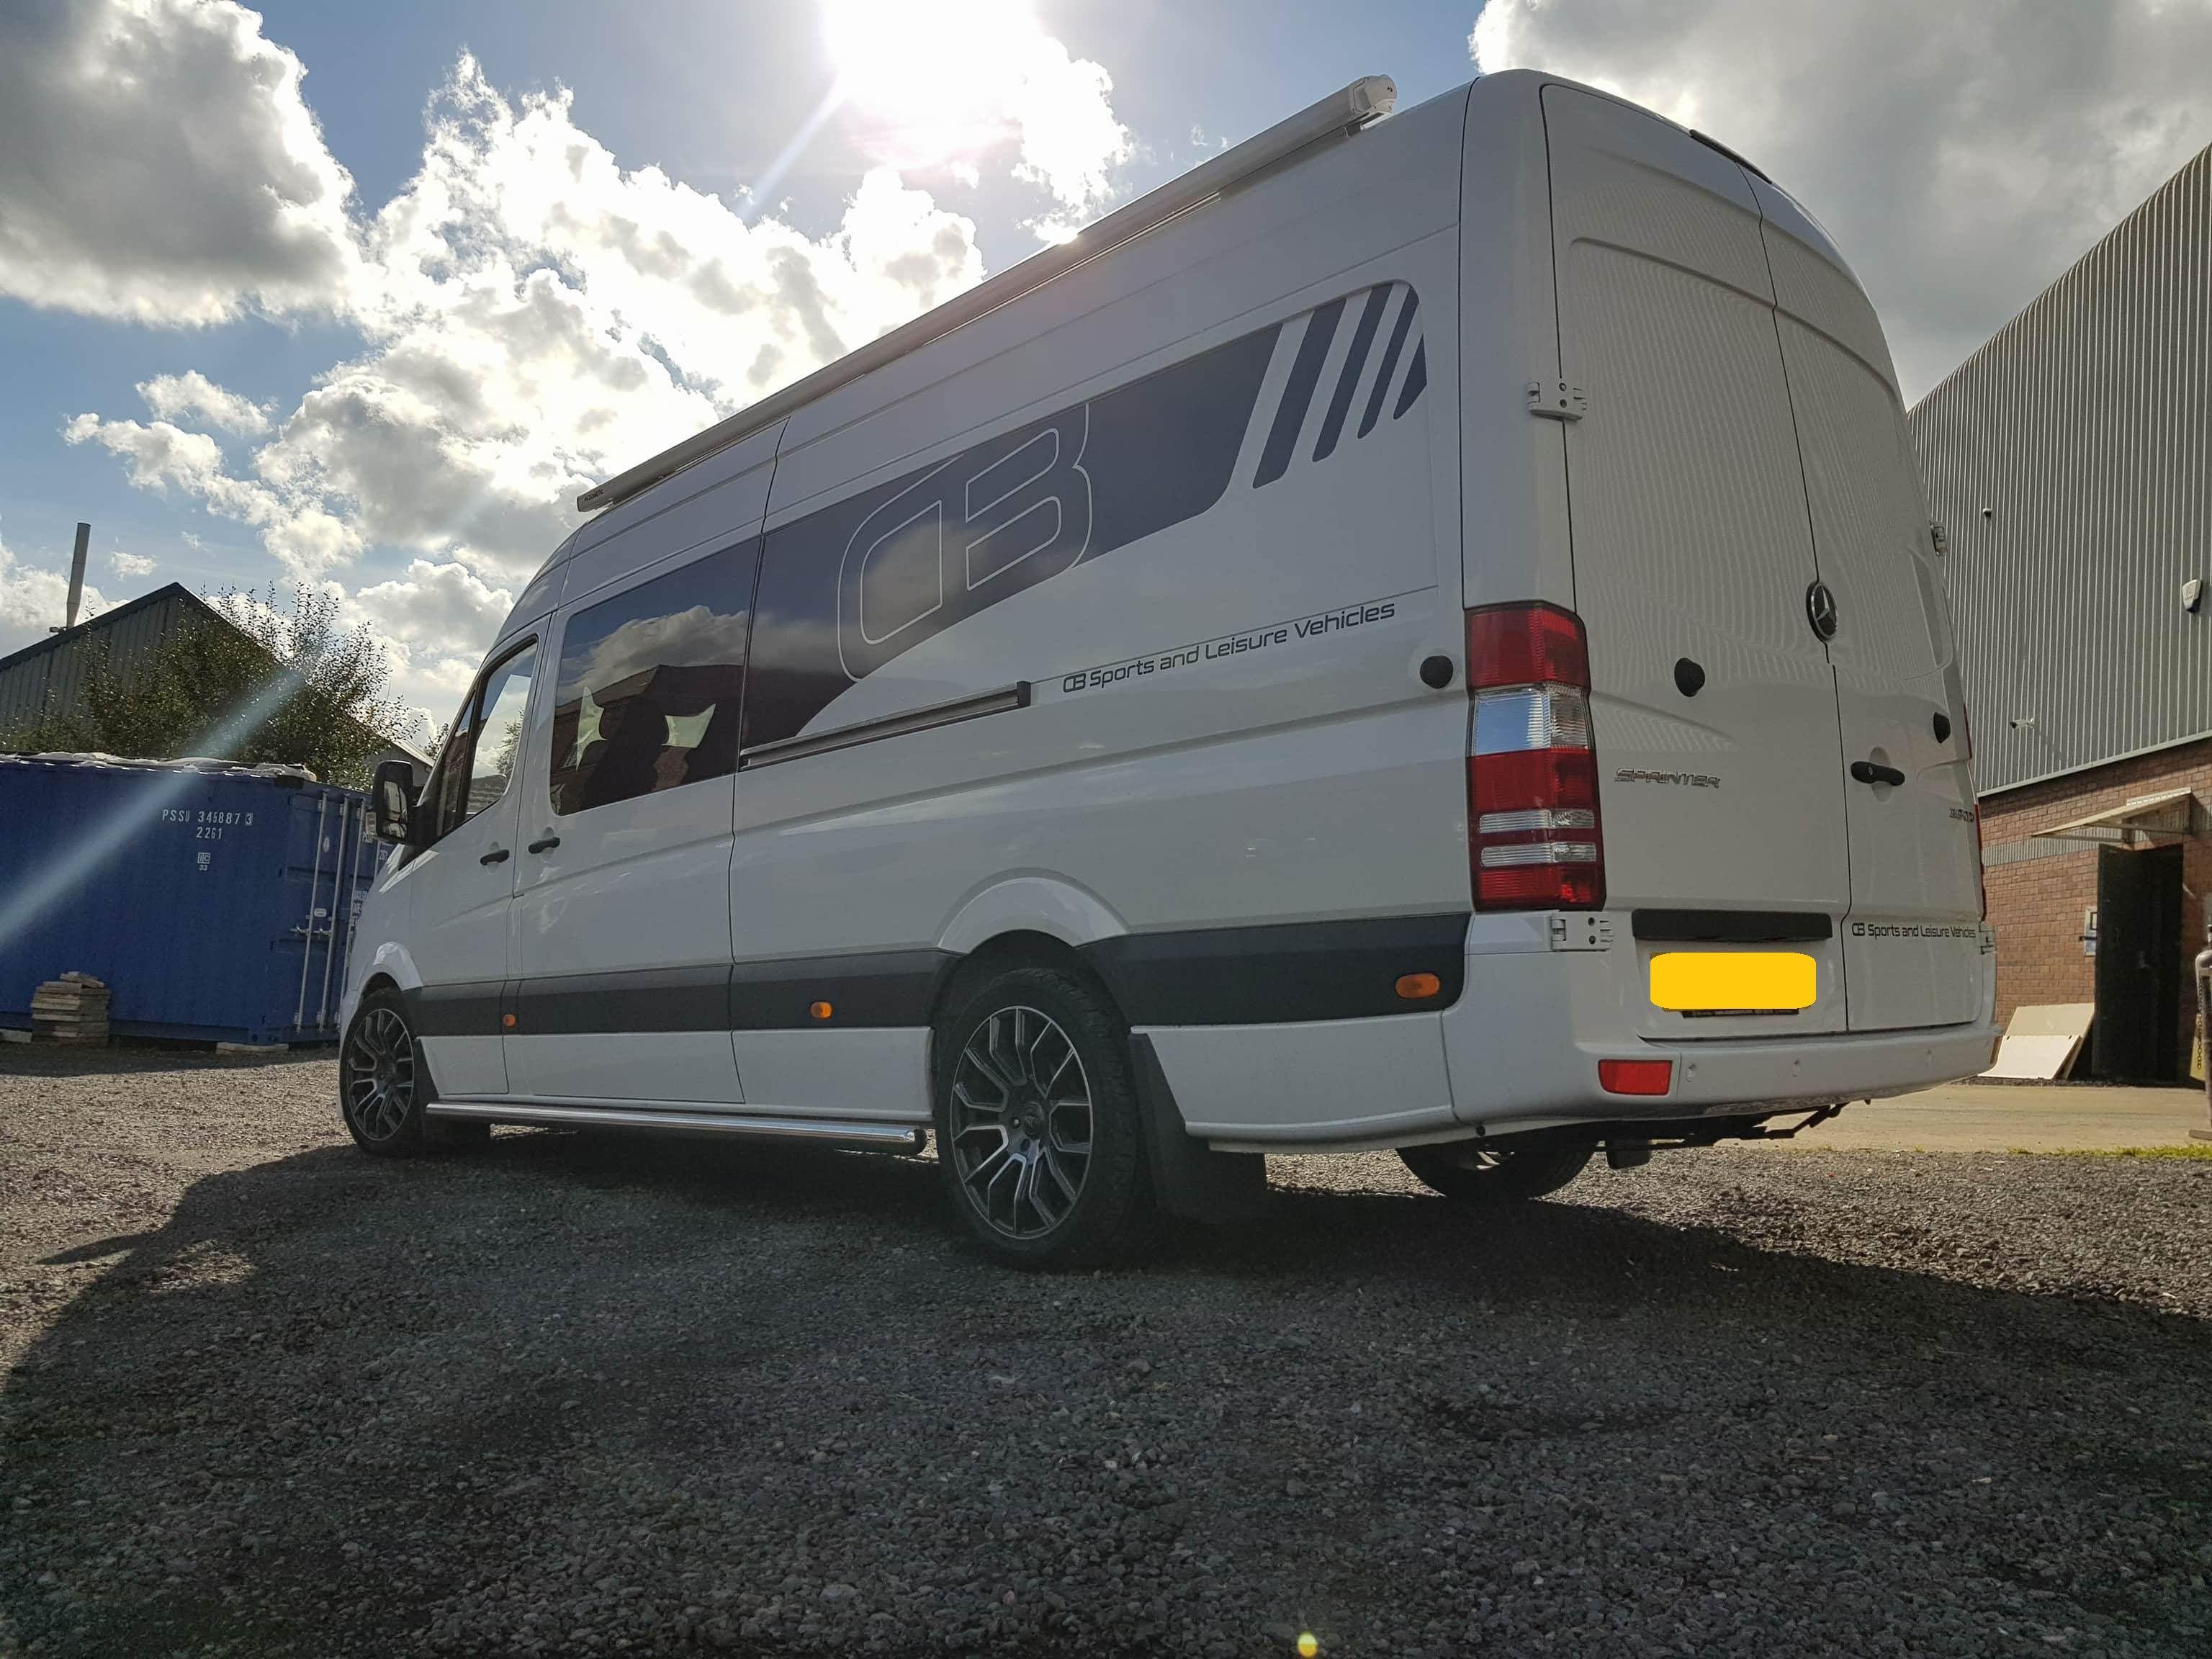 passenger van for accommodation rental sale a sprinter benz luxe mercedes rv rent